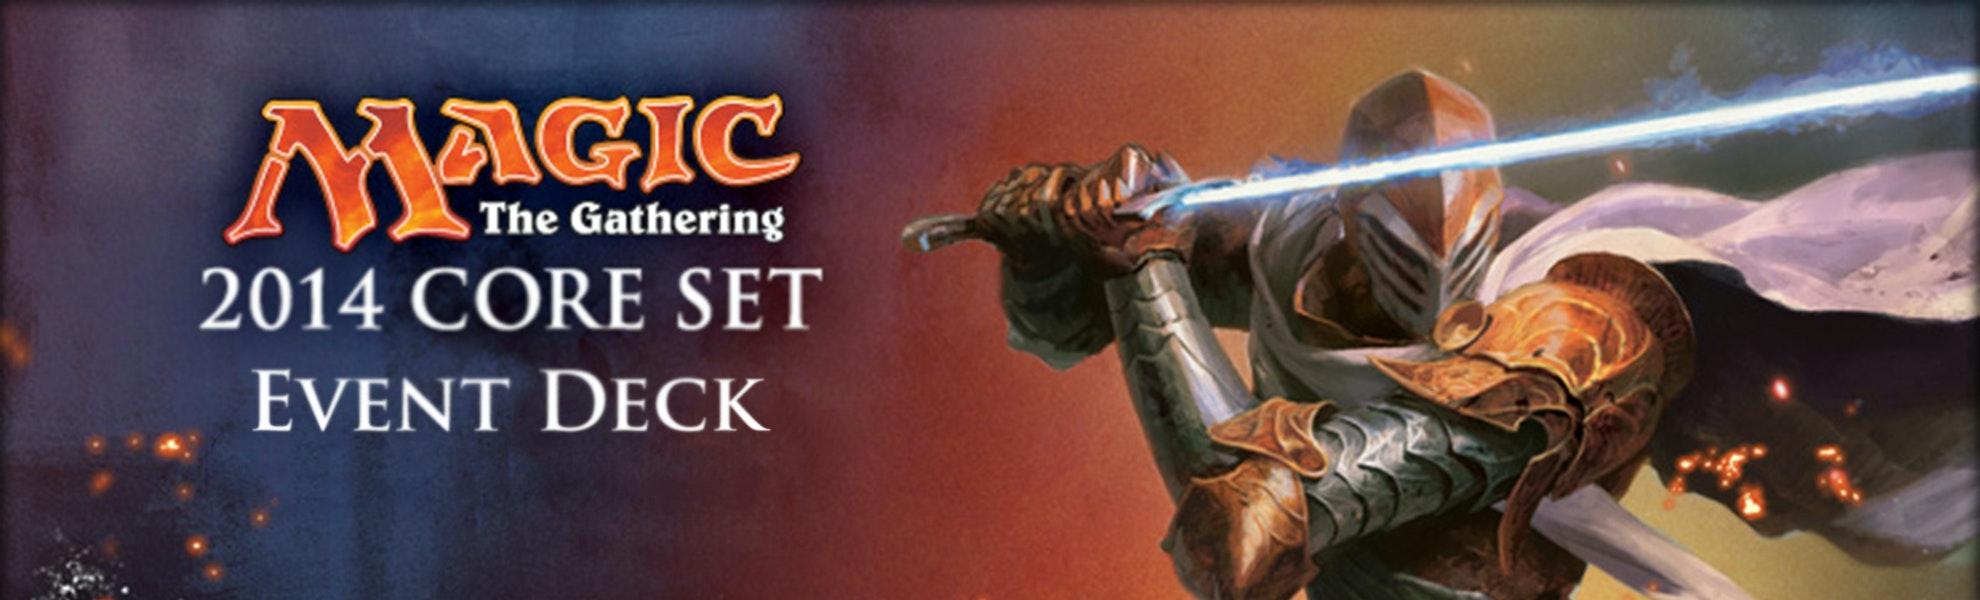 Magic Core 2014 Event Deck